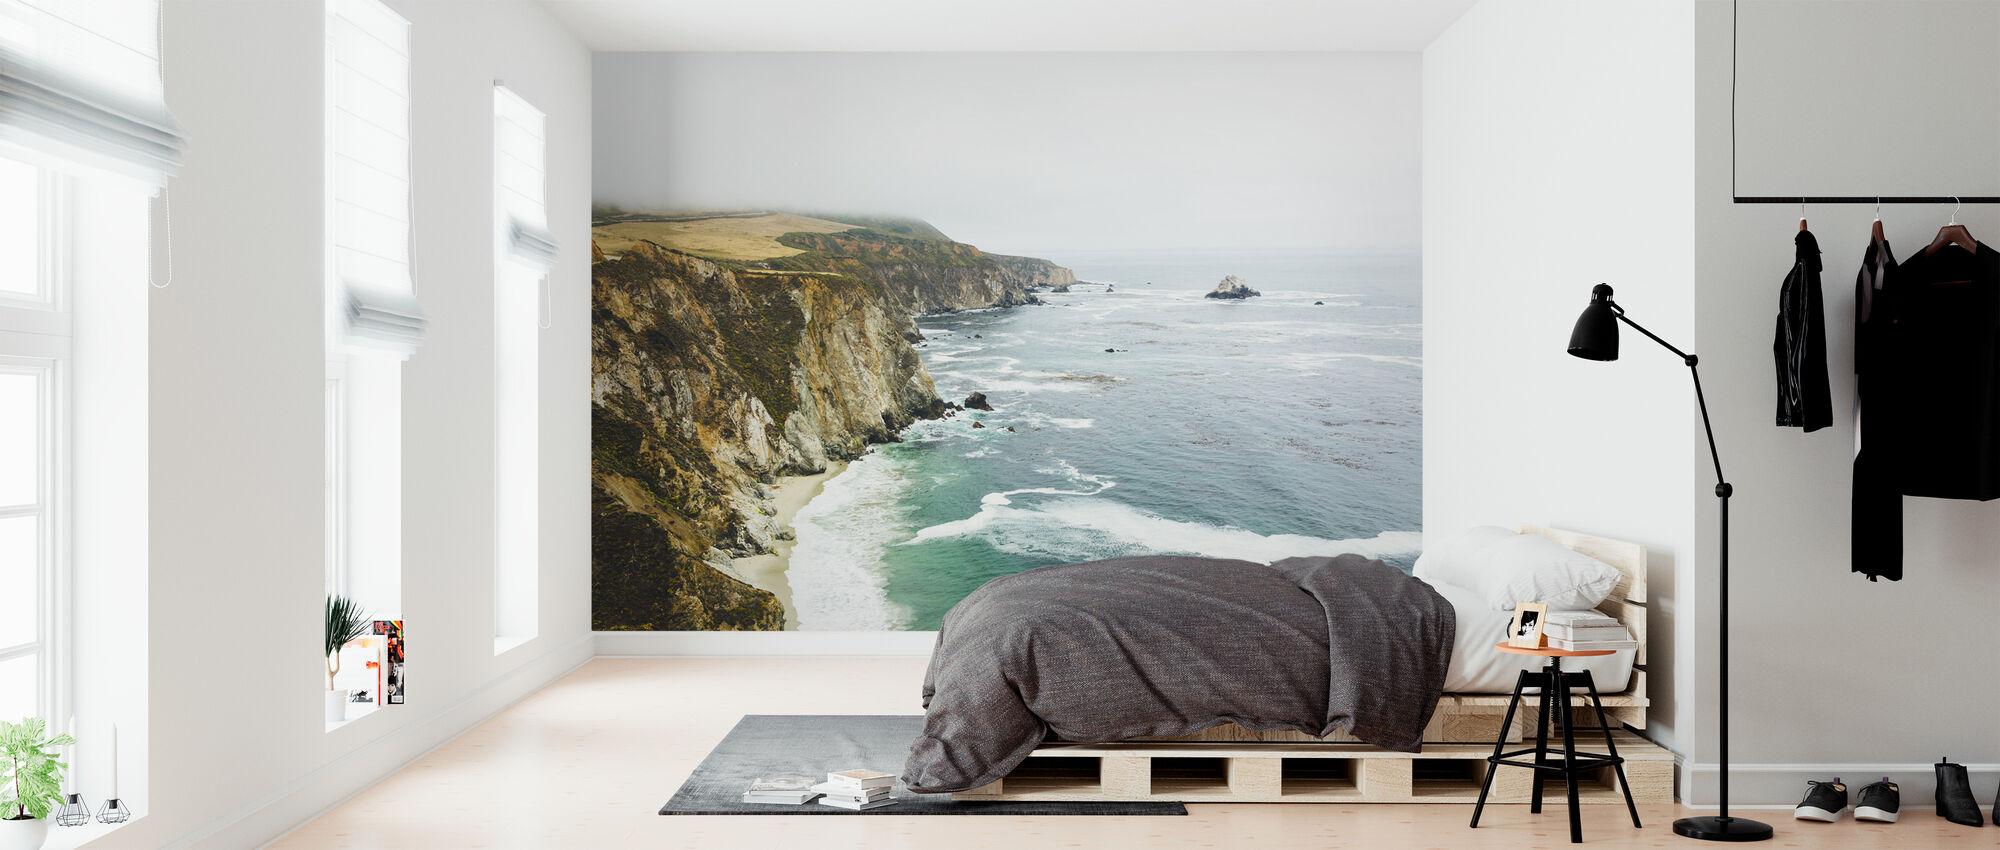 Big Sur, California - Wallpaper - Bedroom